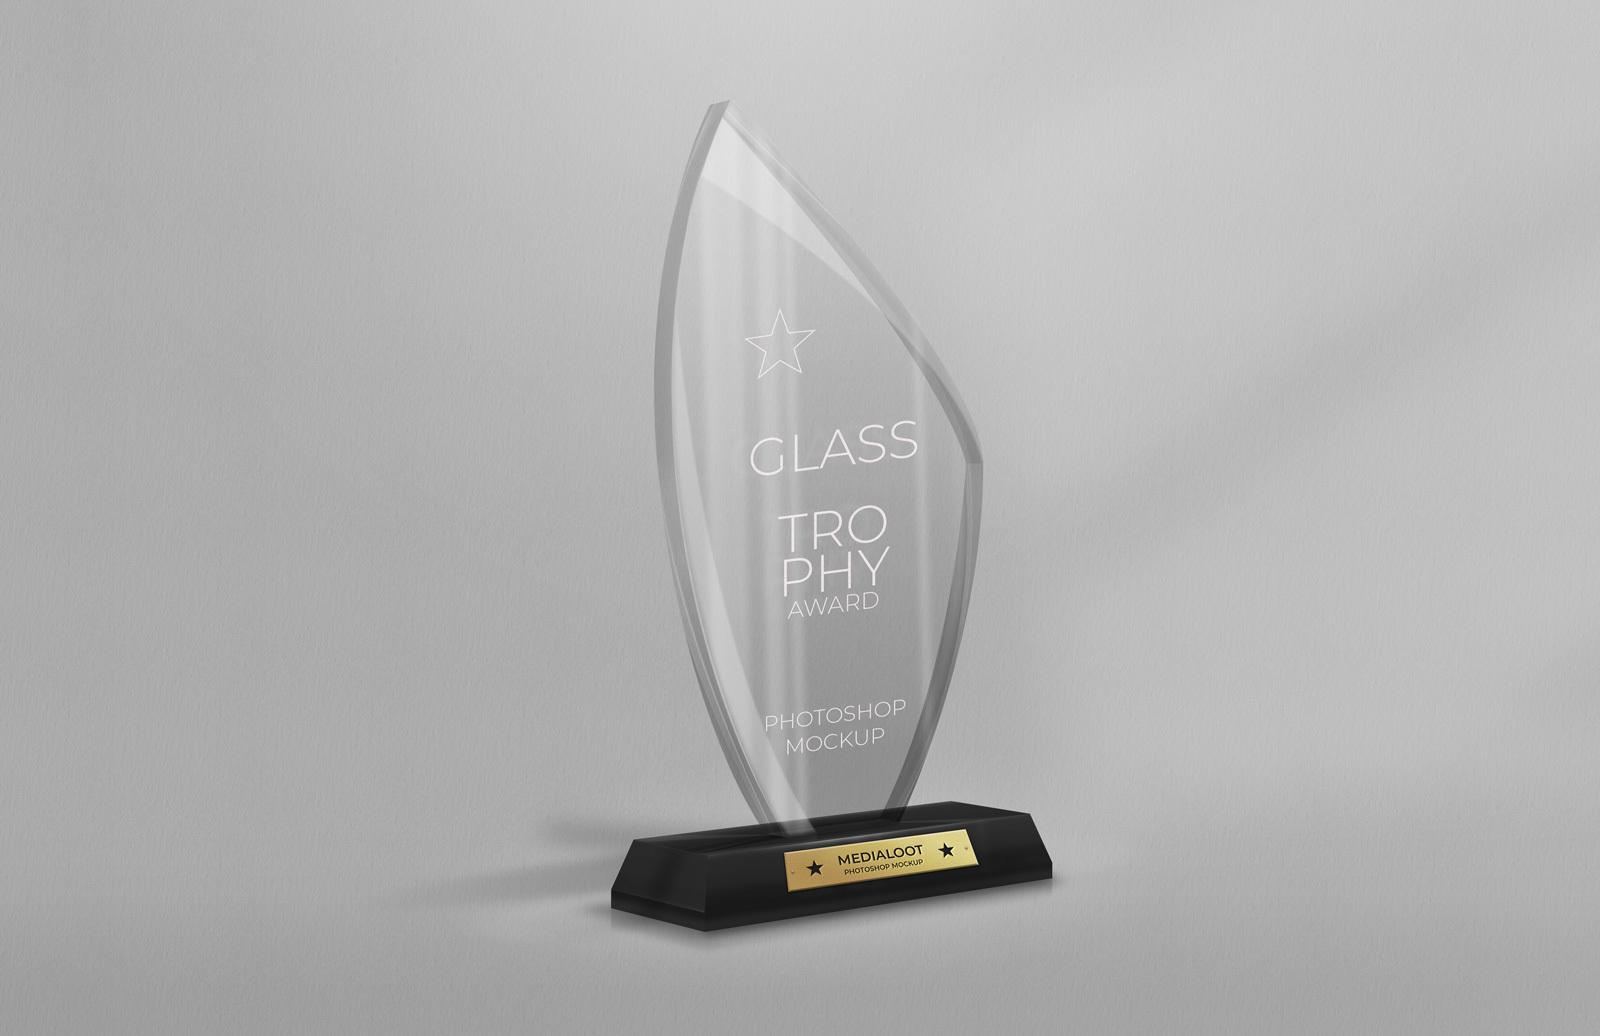 Glass Trophy Award Mockup